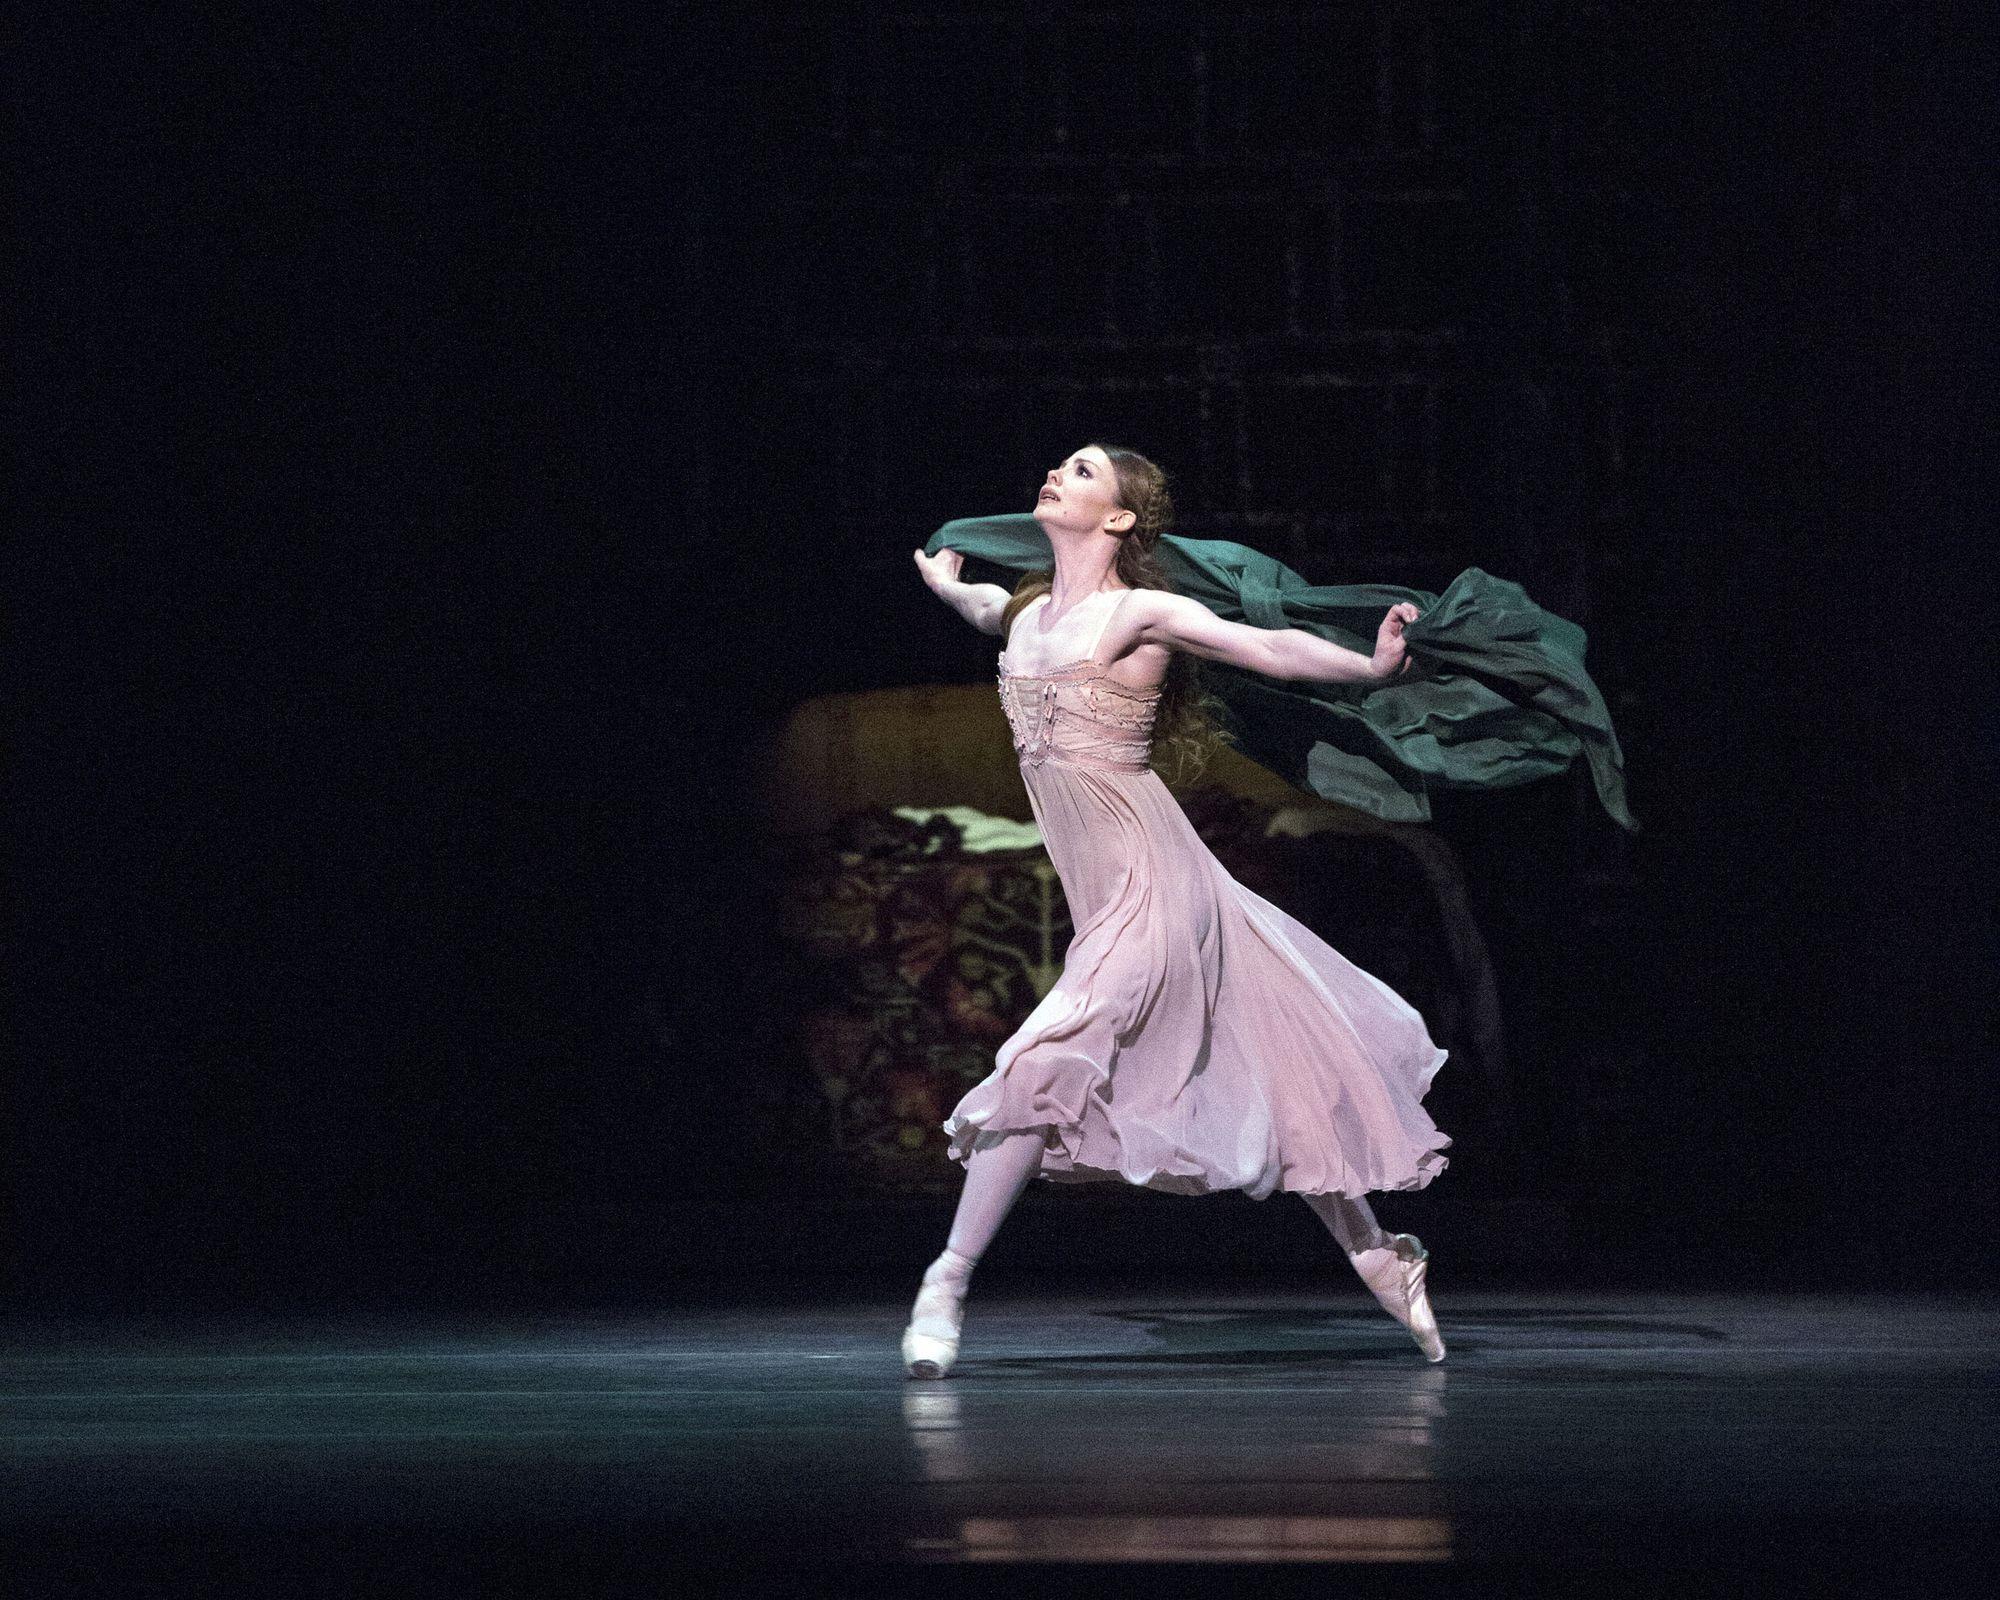 Ballerina Yevgenia Obraztsova: career, repertoire, personal life 45